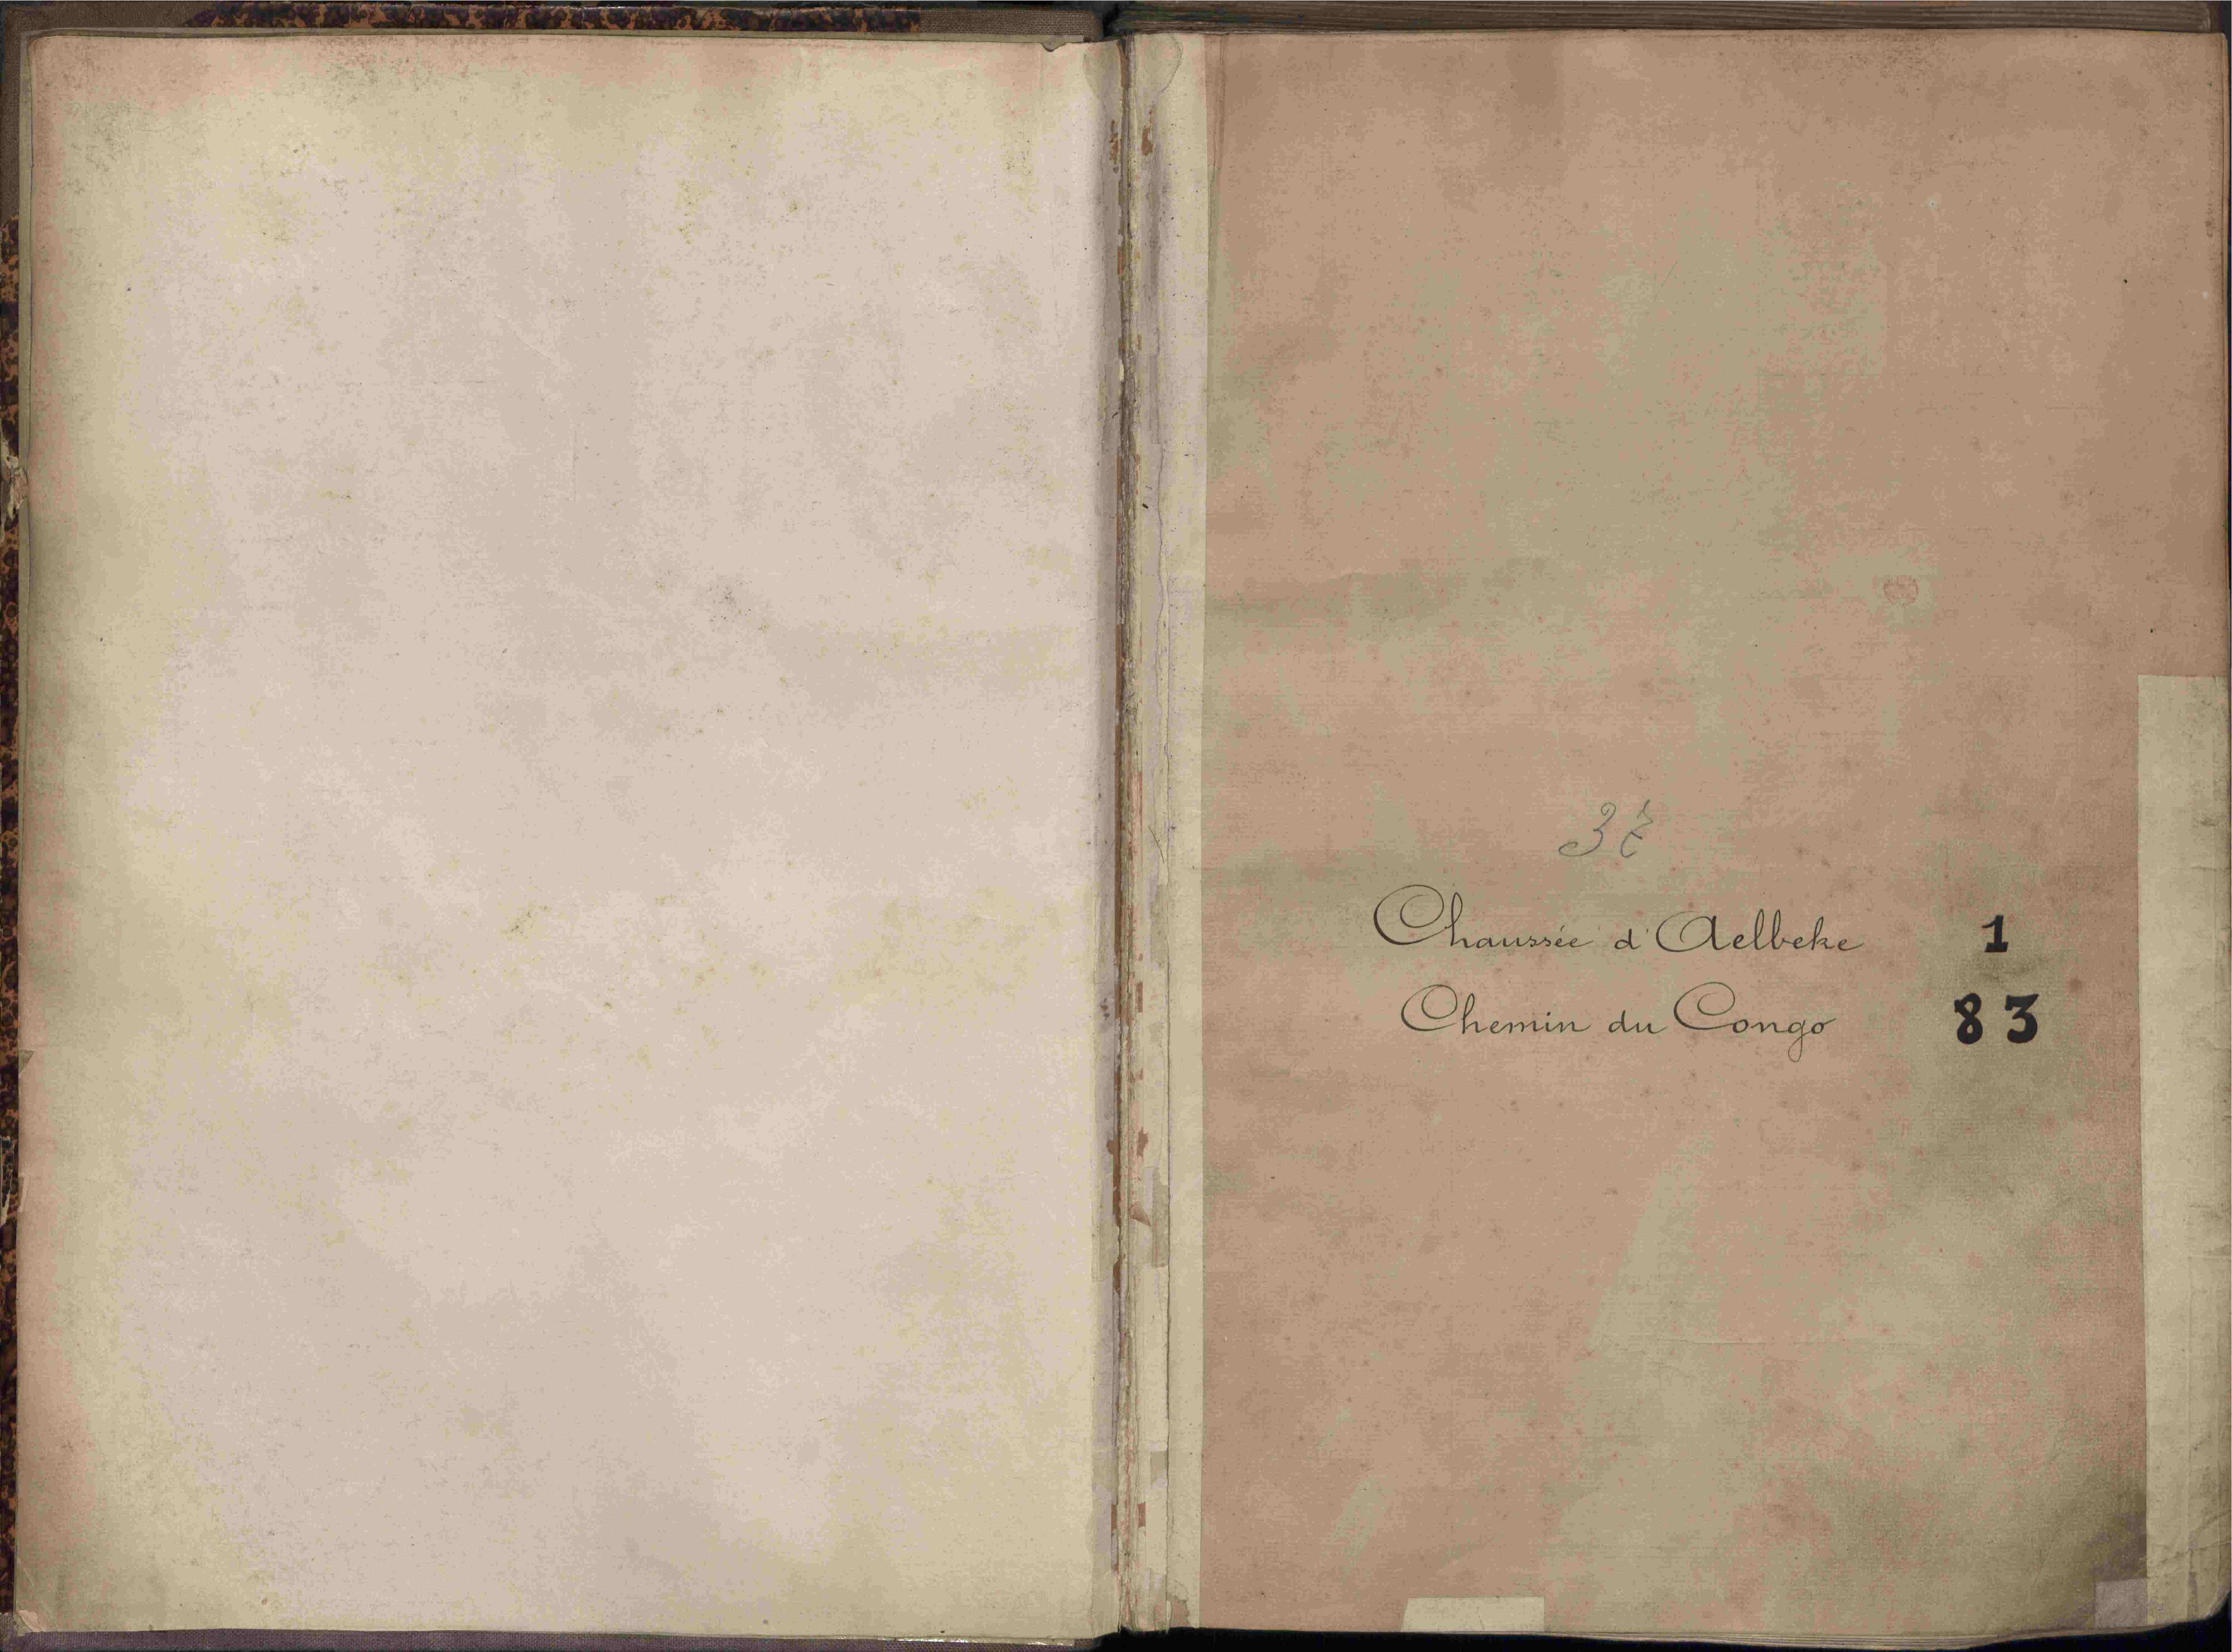 Bevolkingsregister Kortrijk 1890 boek 37